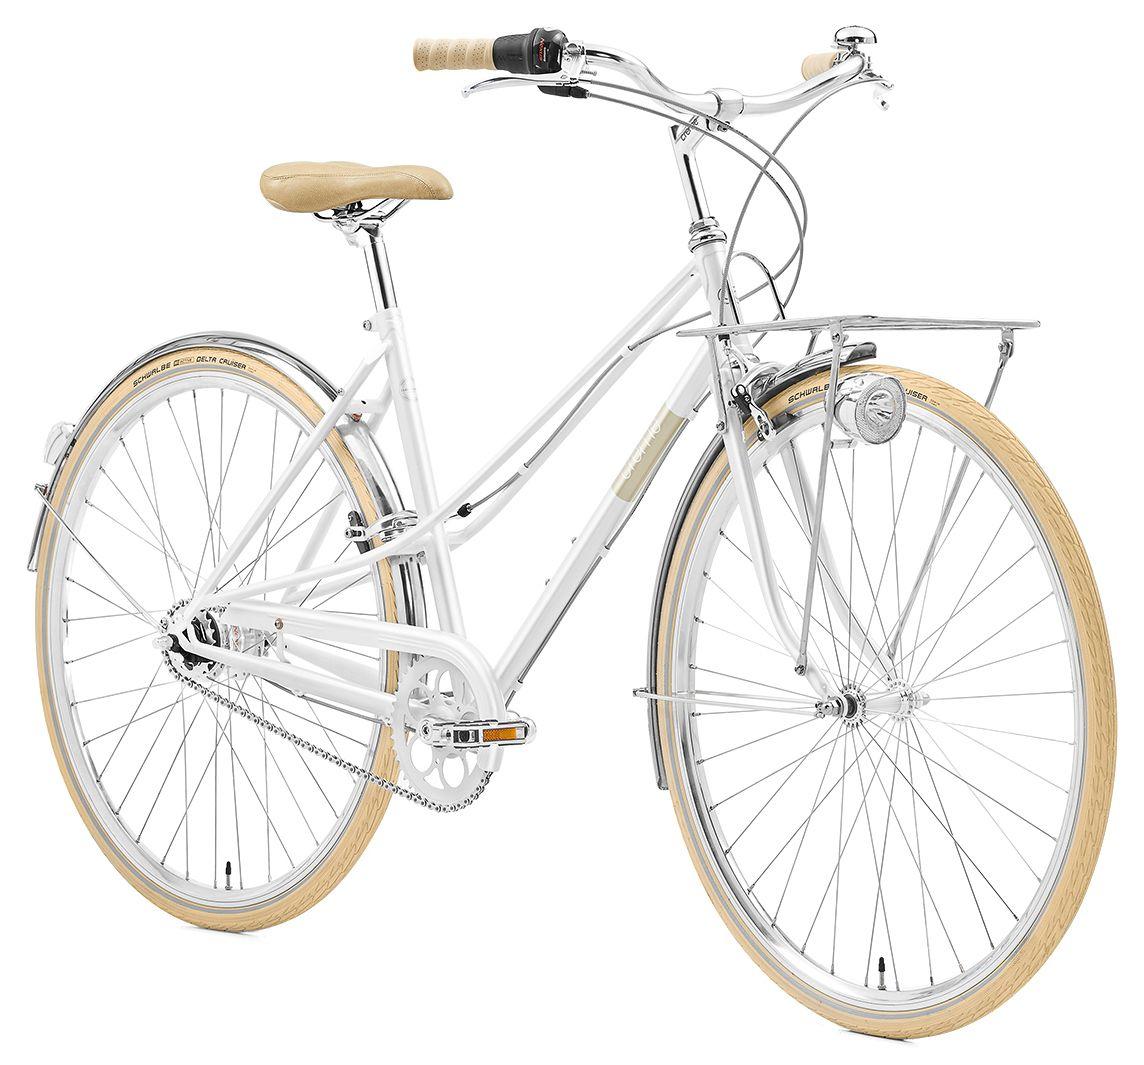 Creme Caferacer Lady Solo 2019 28 Zoll 10 Fahrrad Xxl In 2020 Fahrrad Xxl Vintage Fahrrad Fahrrad